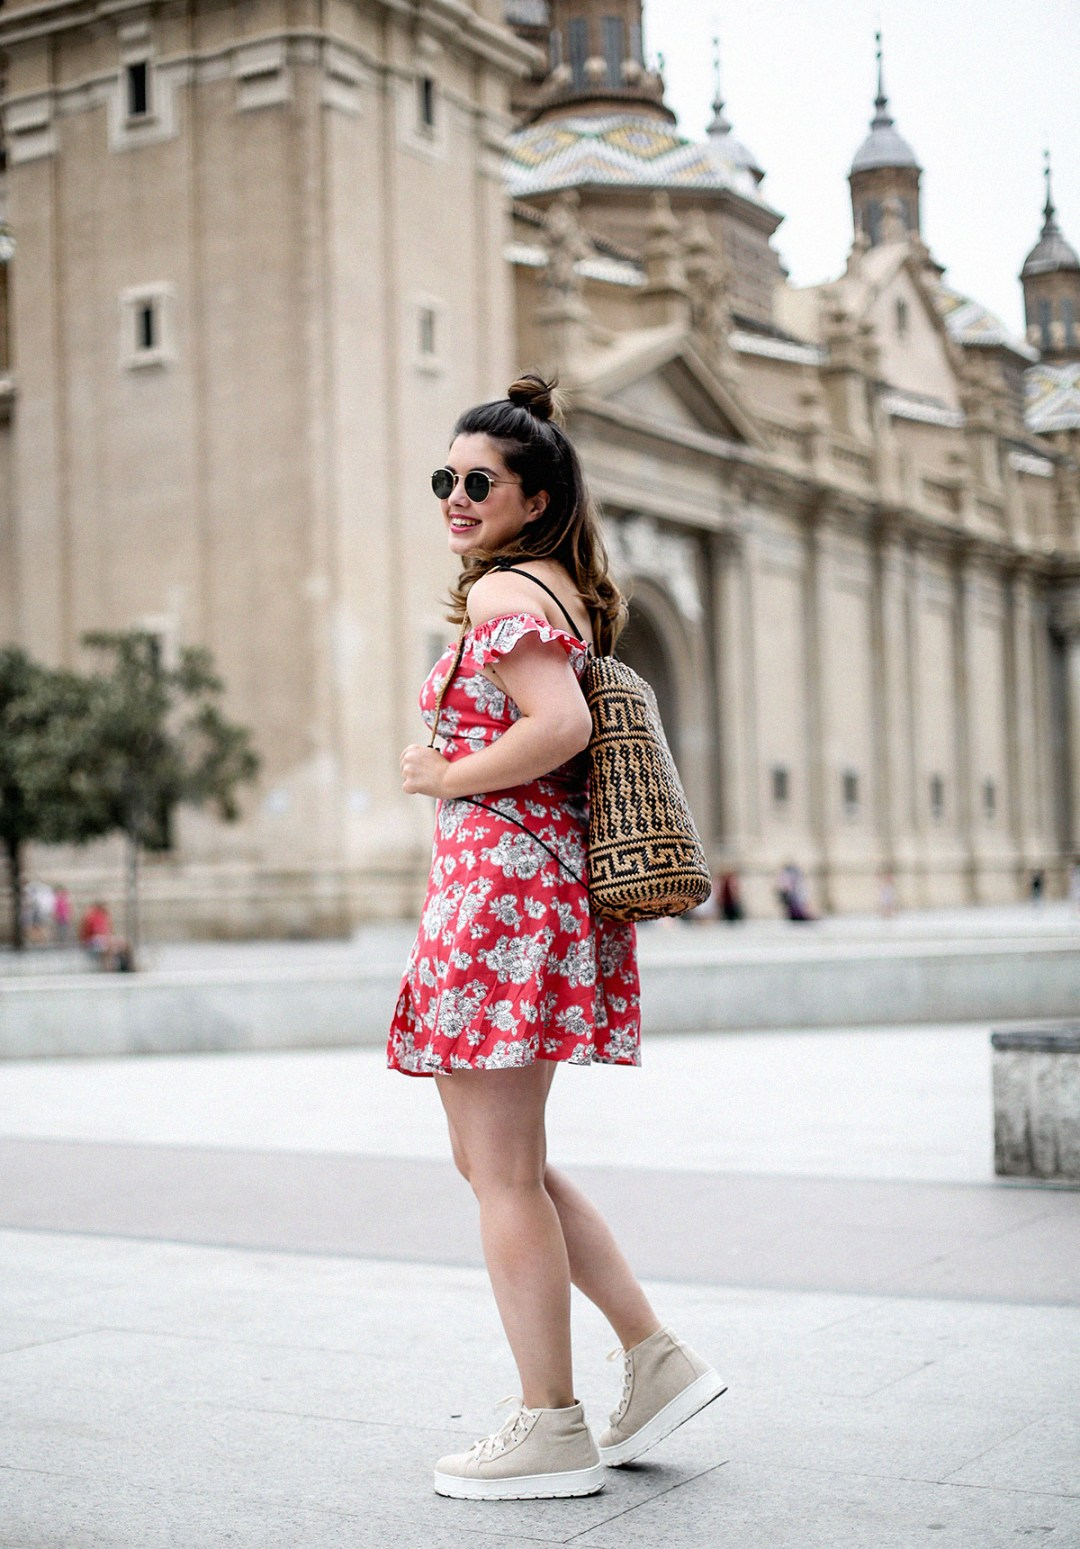 vestido-hombros-al-aire-asos-mochila-ratan-zaragoza-travel10